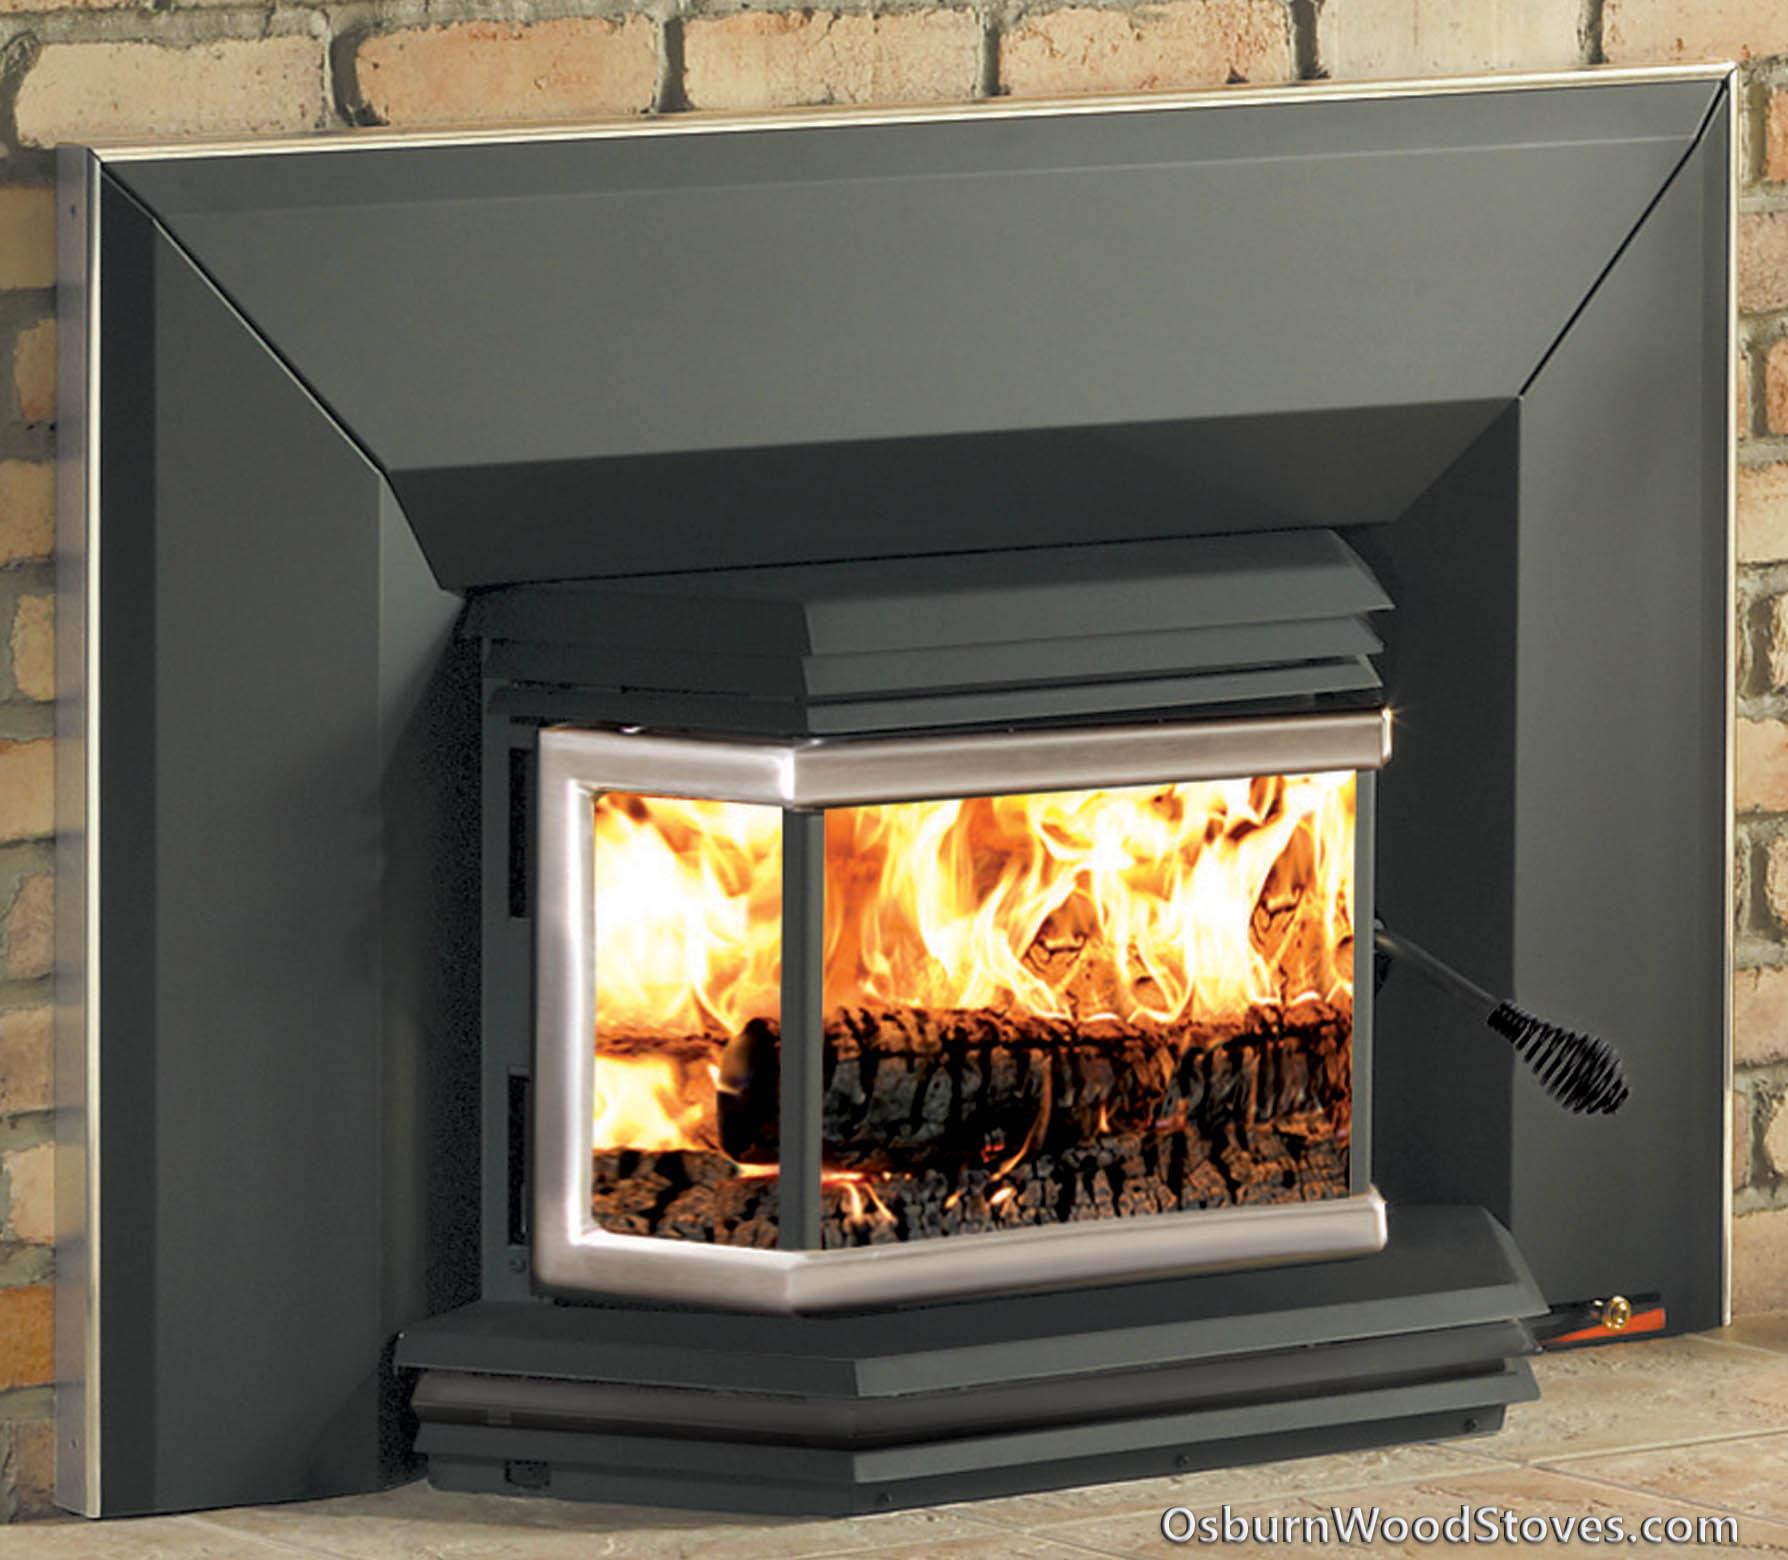 Osburn 1800 Fireplace Insert at OsburnWoodStoves.com